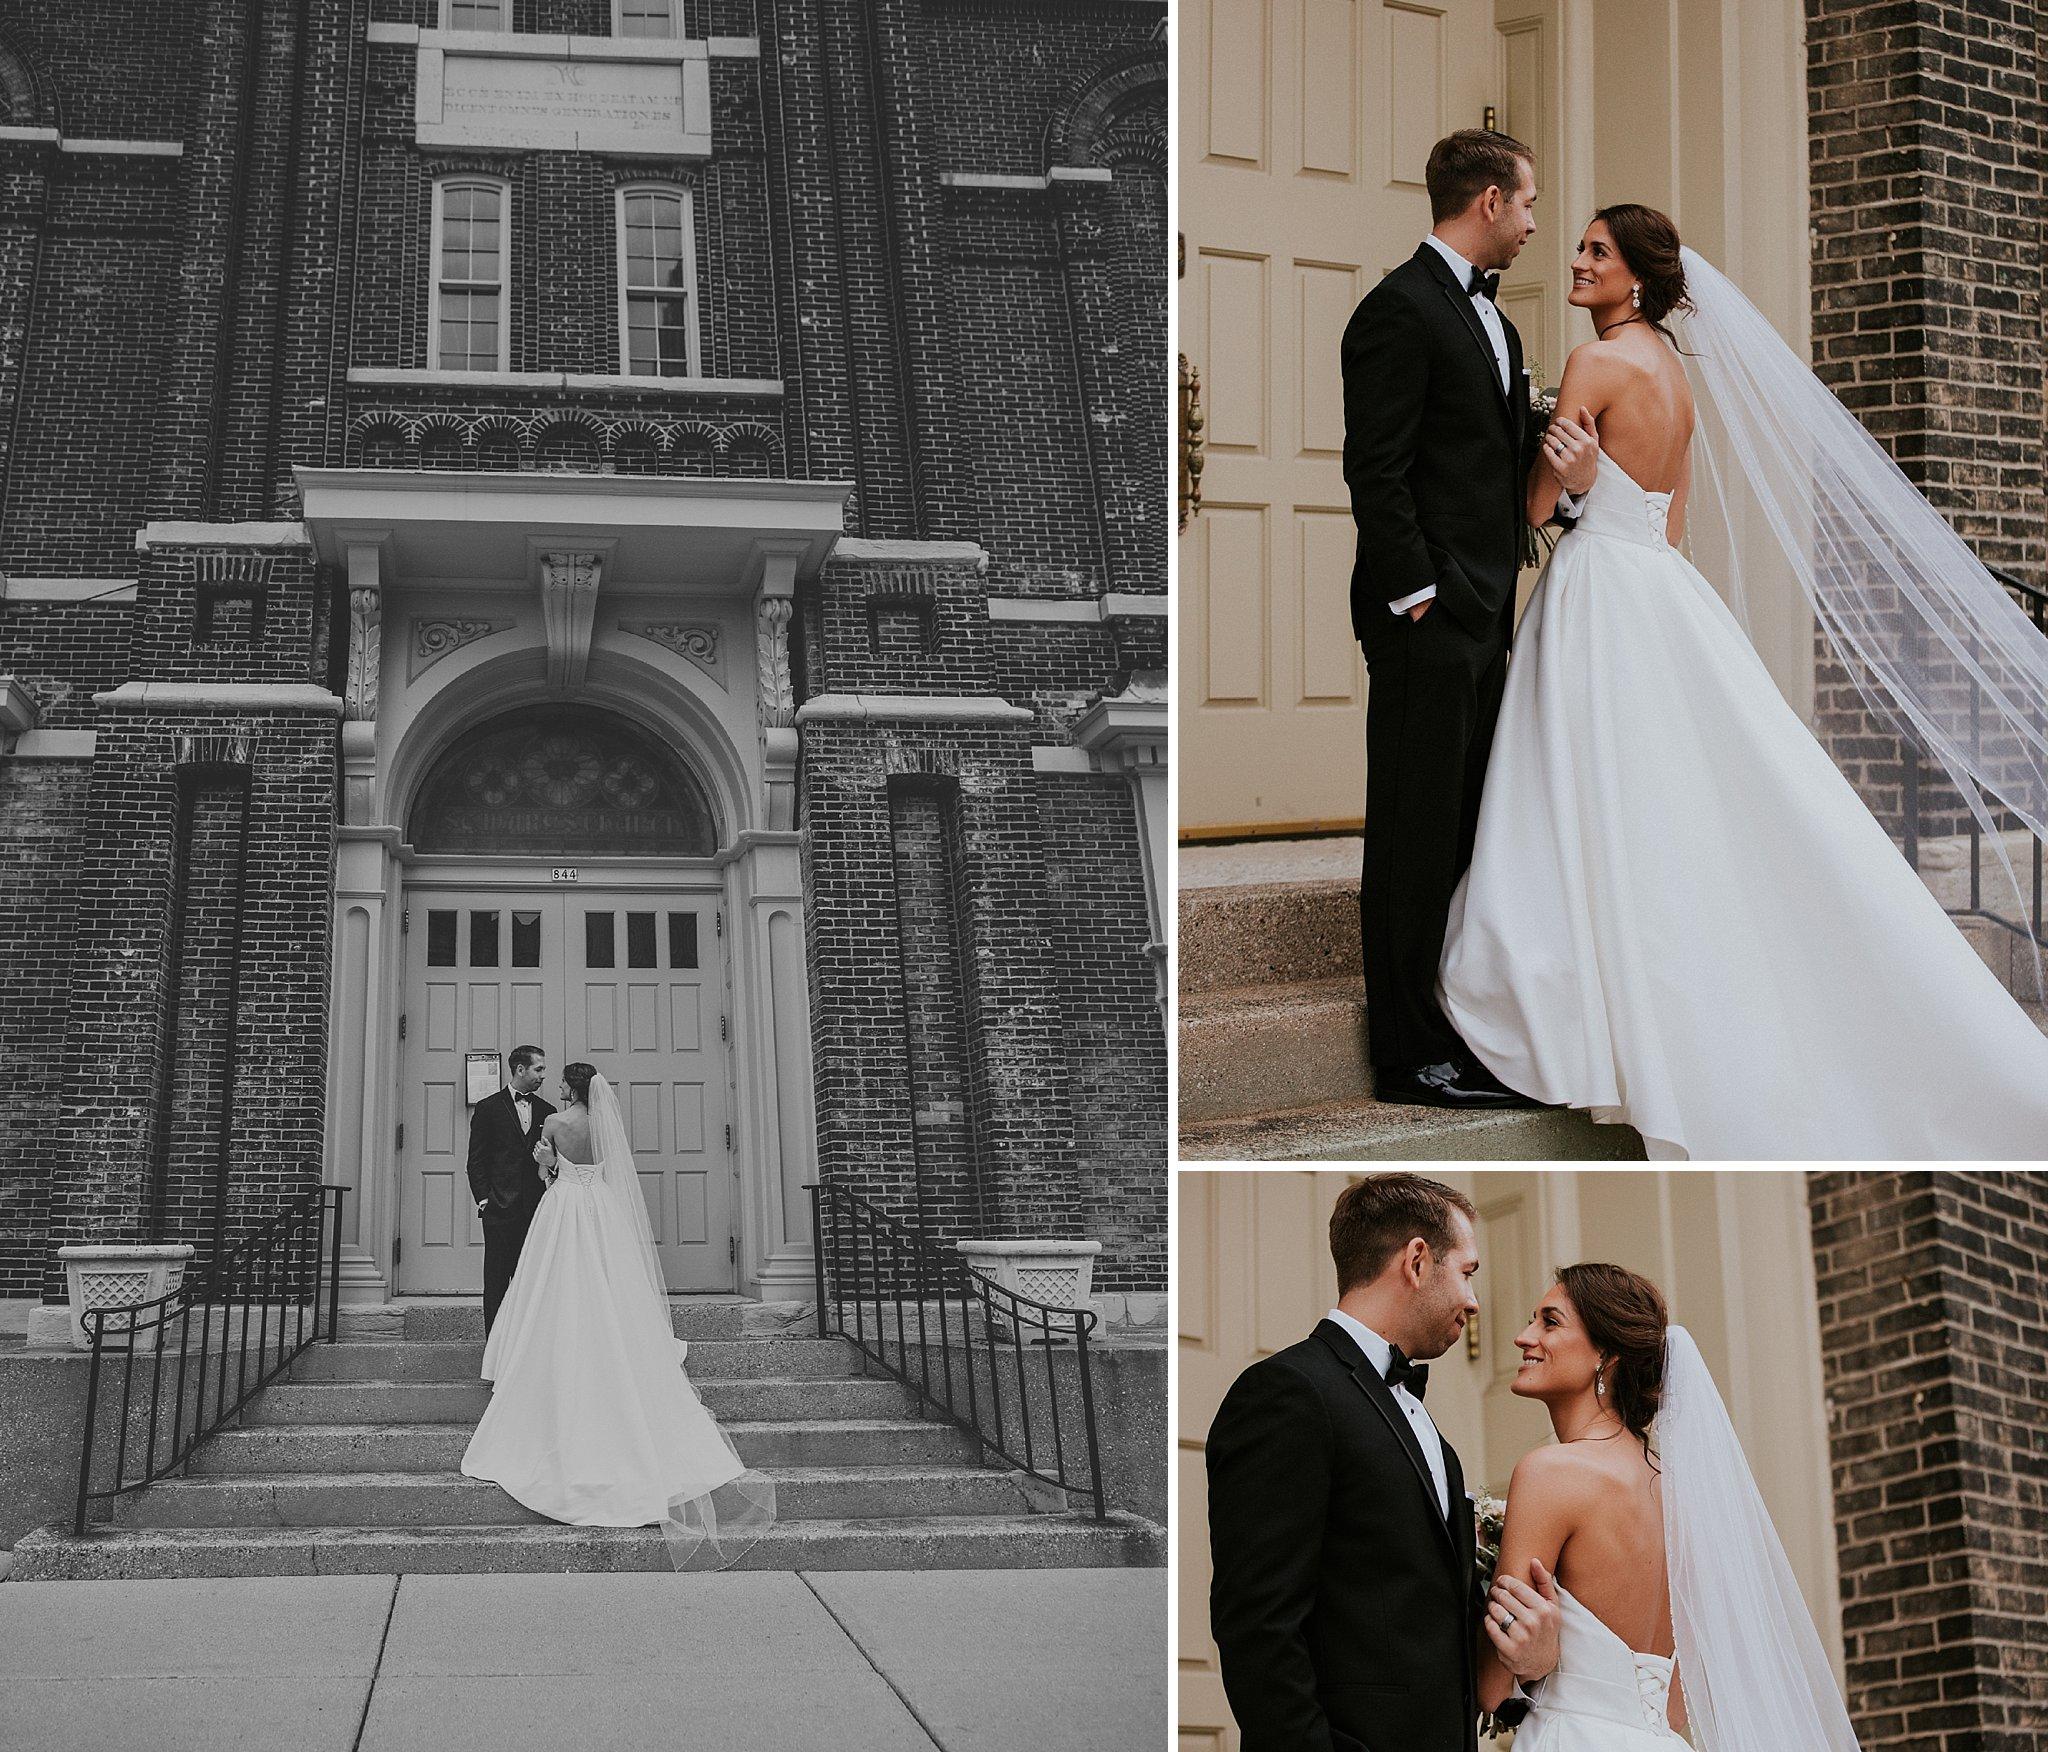 Matt-Lauren_St-Marys_Hilton-City-Center-Milwaukee-Wedding_liller-photo_0033.jpg